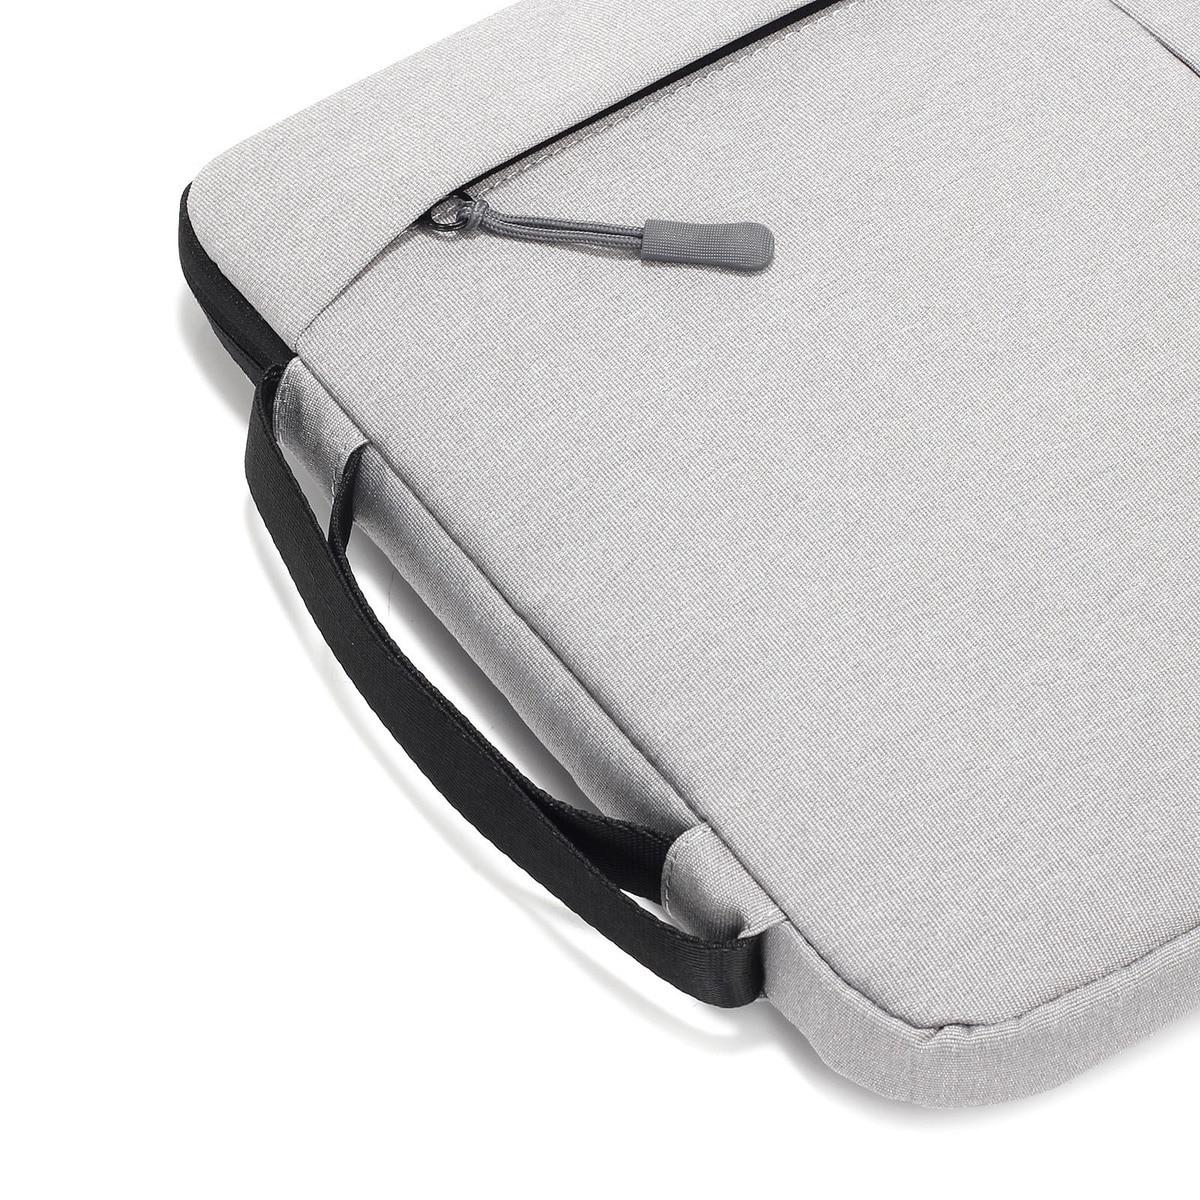 Gmilli Nylone Unisex Zakelijke Laptop Sleeve Tas Notebook Tas Pouch - Notebook accessoires - Foto 3